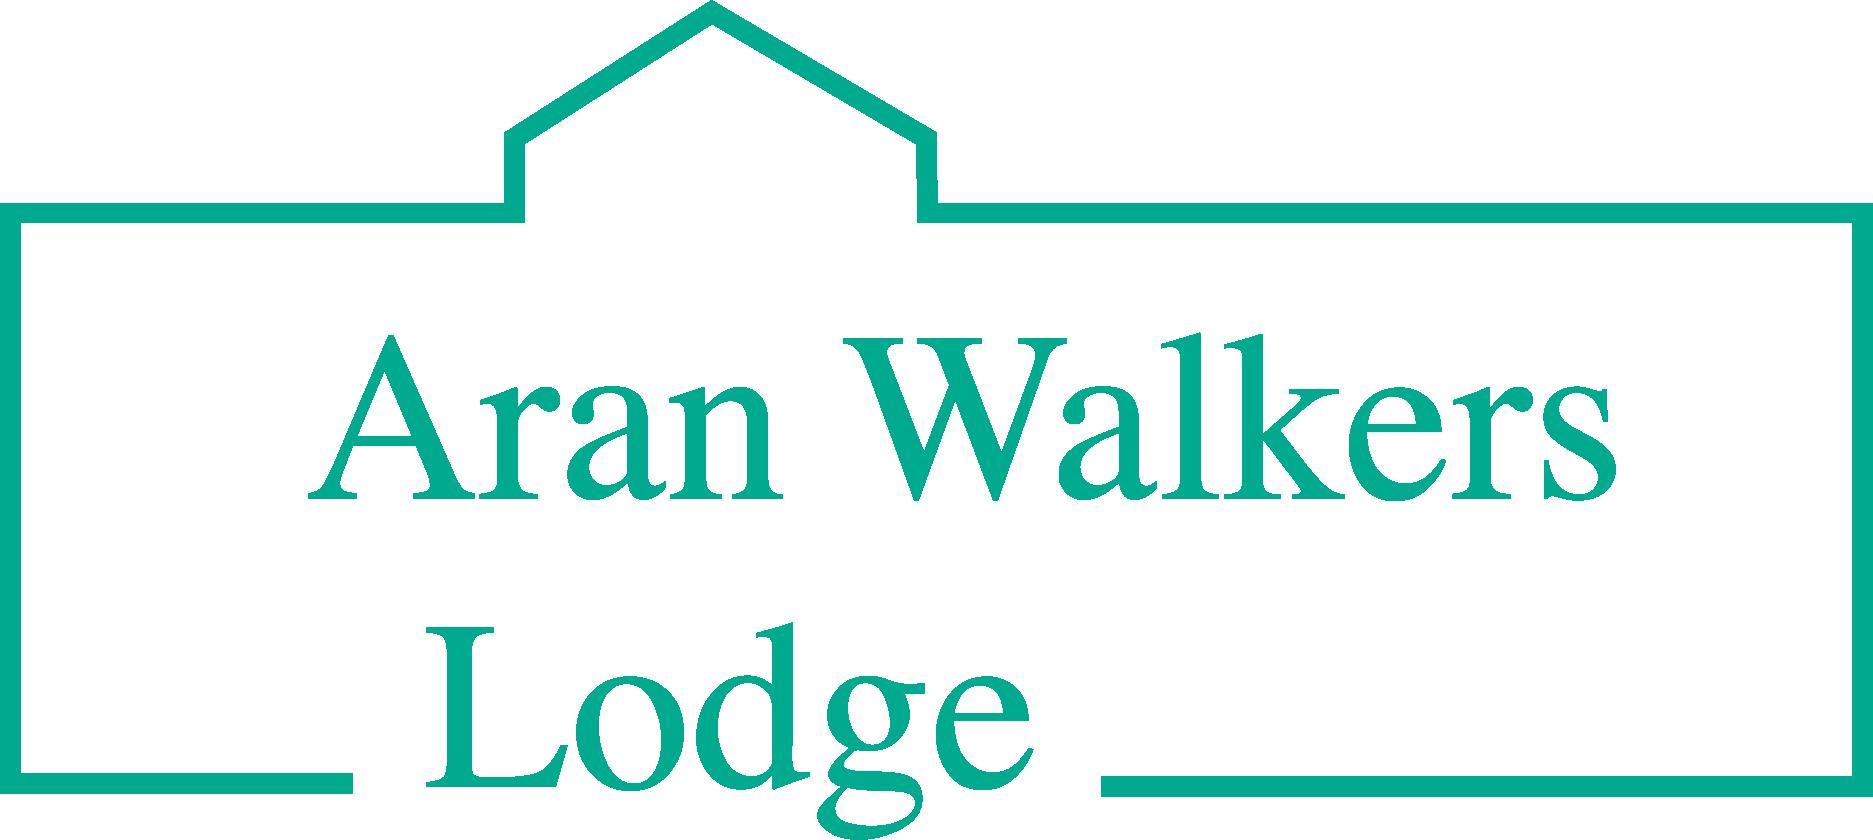 Aran Walkers Lodge